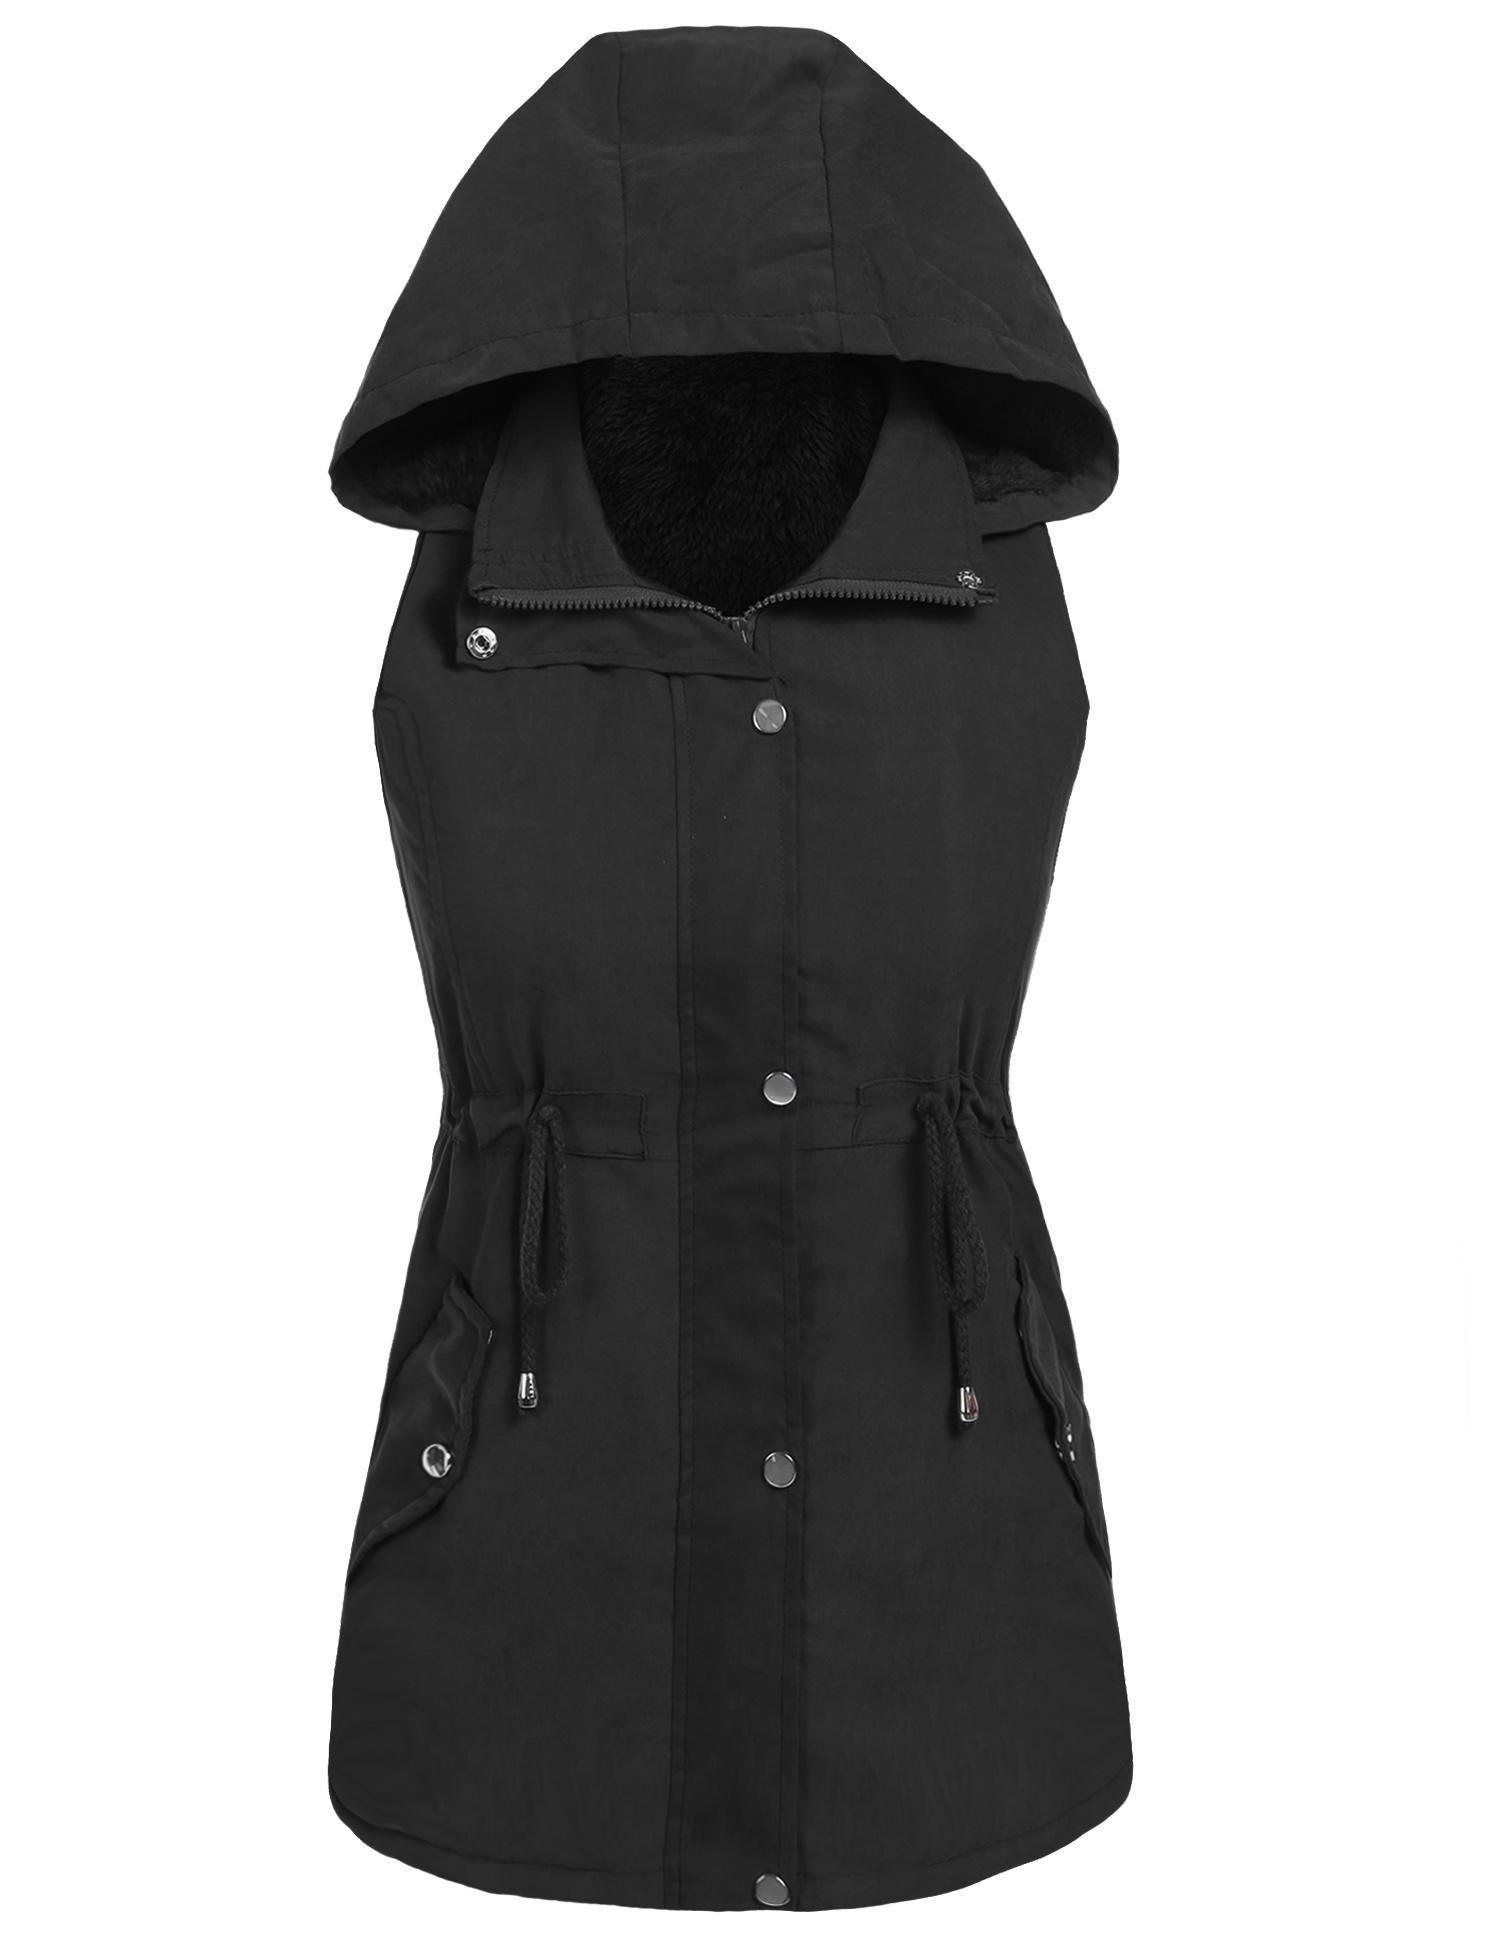 Hufcor Womens Lightweight Sleeveless Military Drawstring Zipper Vest Jackets With Pocket(Black,S)